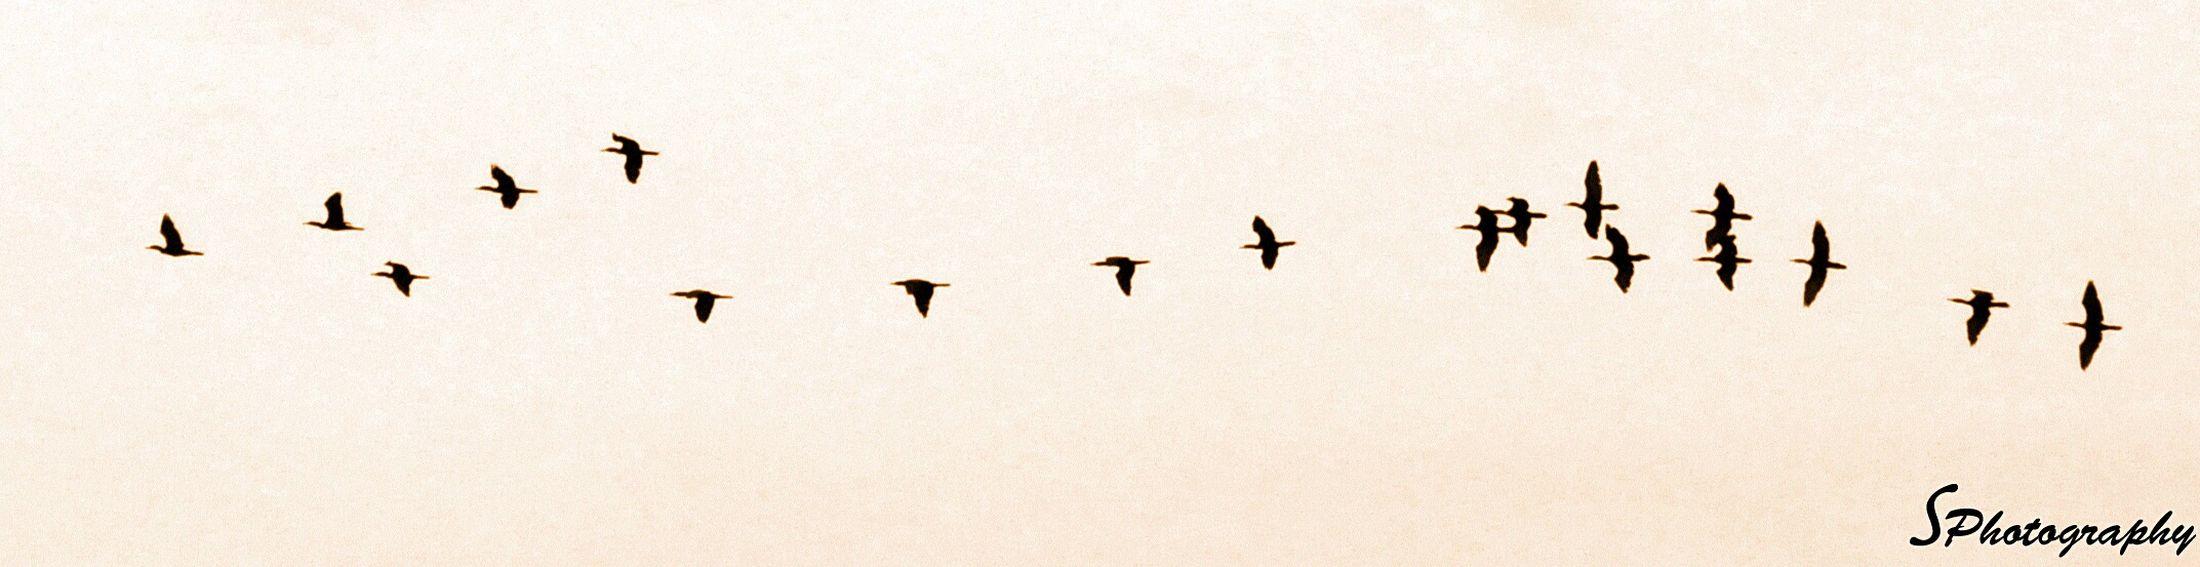 Bird Photography Birds Bird Returning Home Coordination